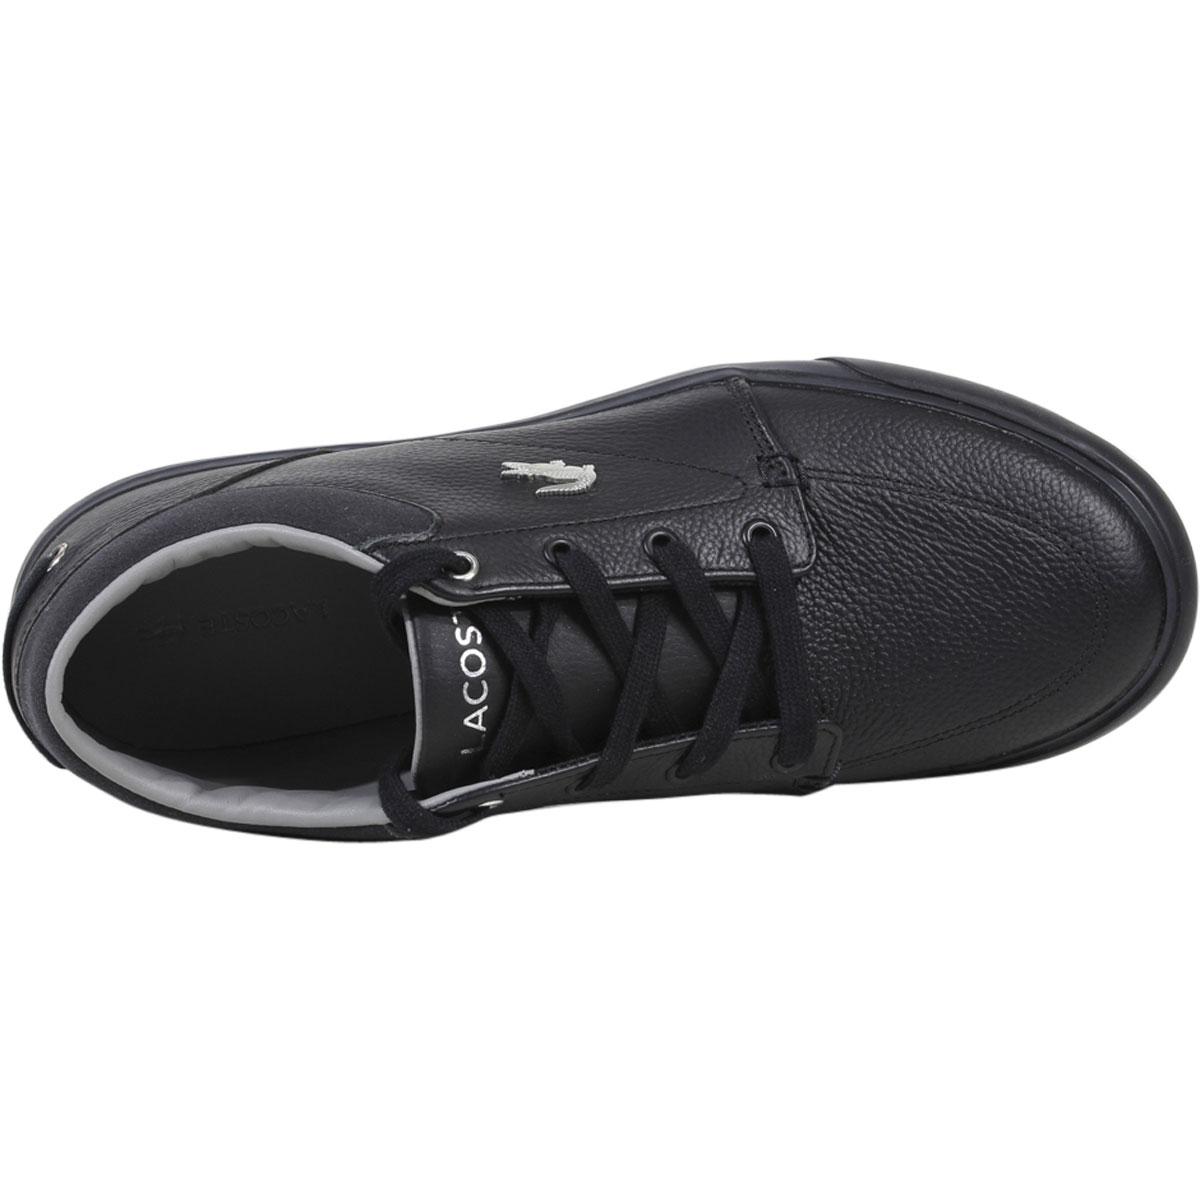 Lacoste-Men-039-s-Bayliss-118-Sneakers-Shoes thumbnail 13